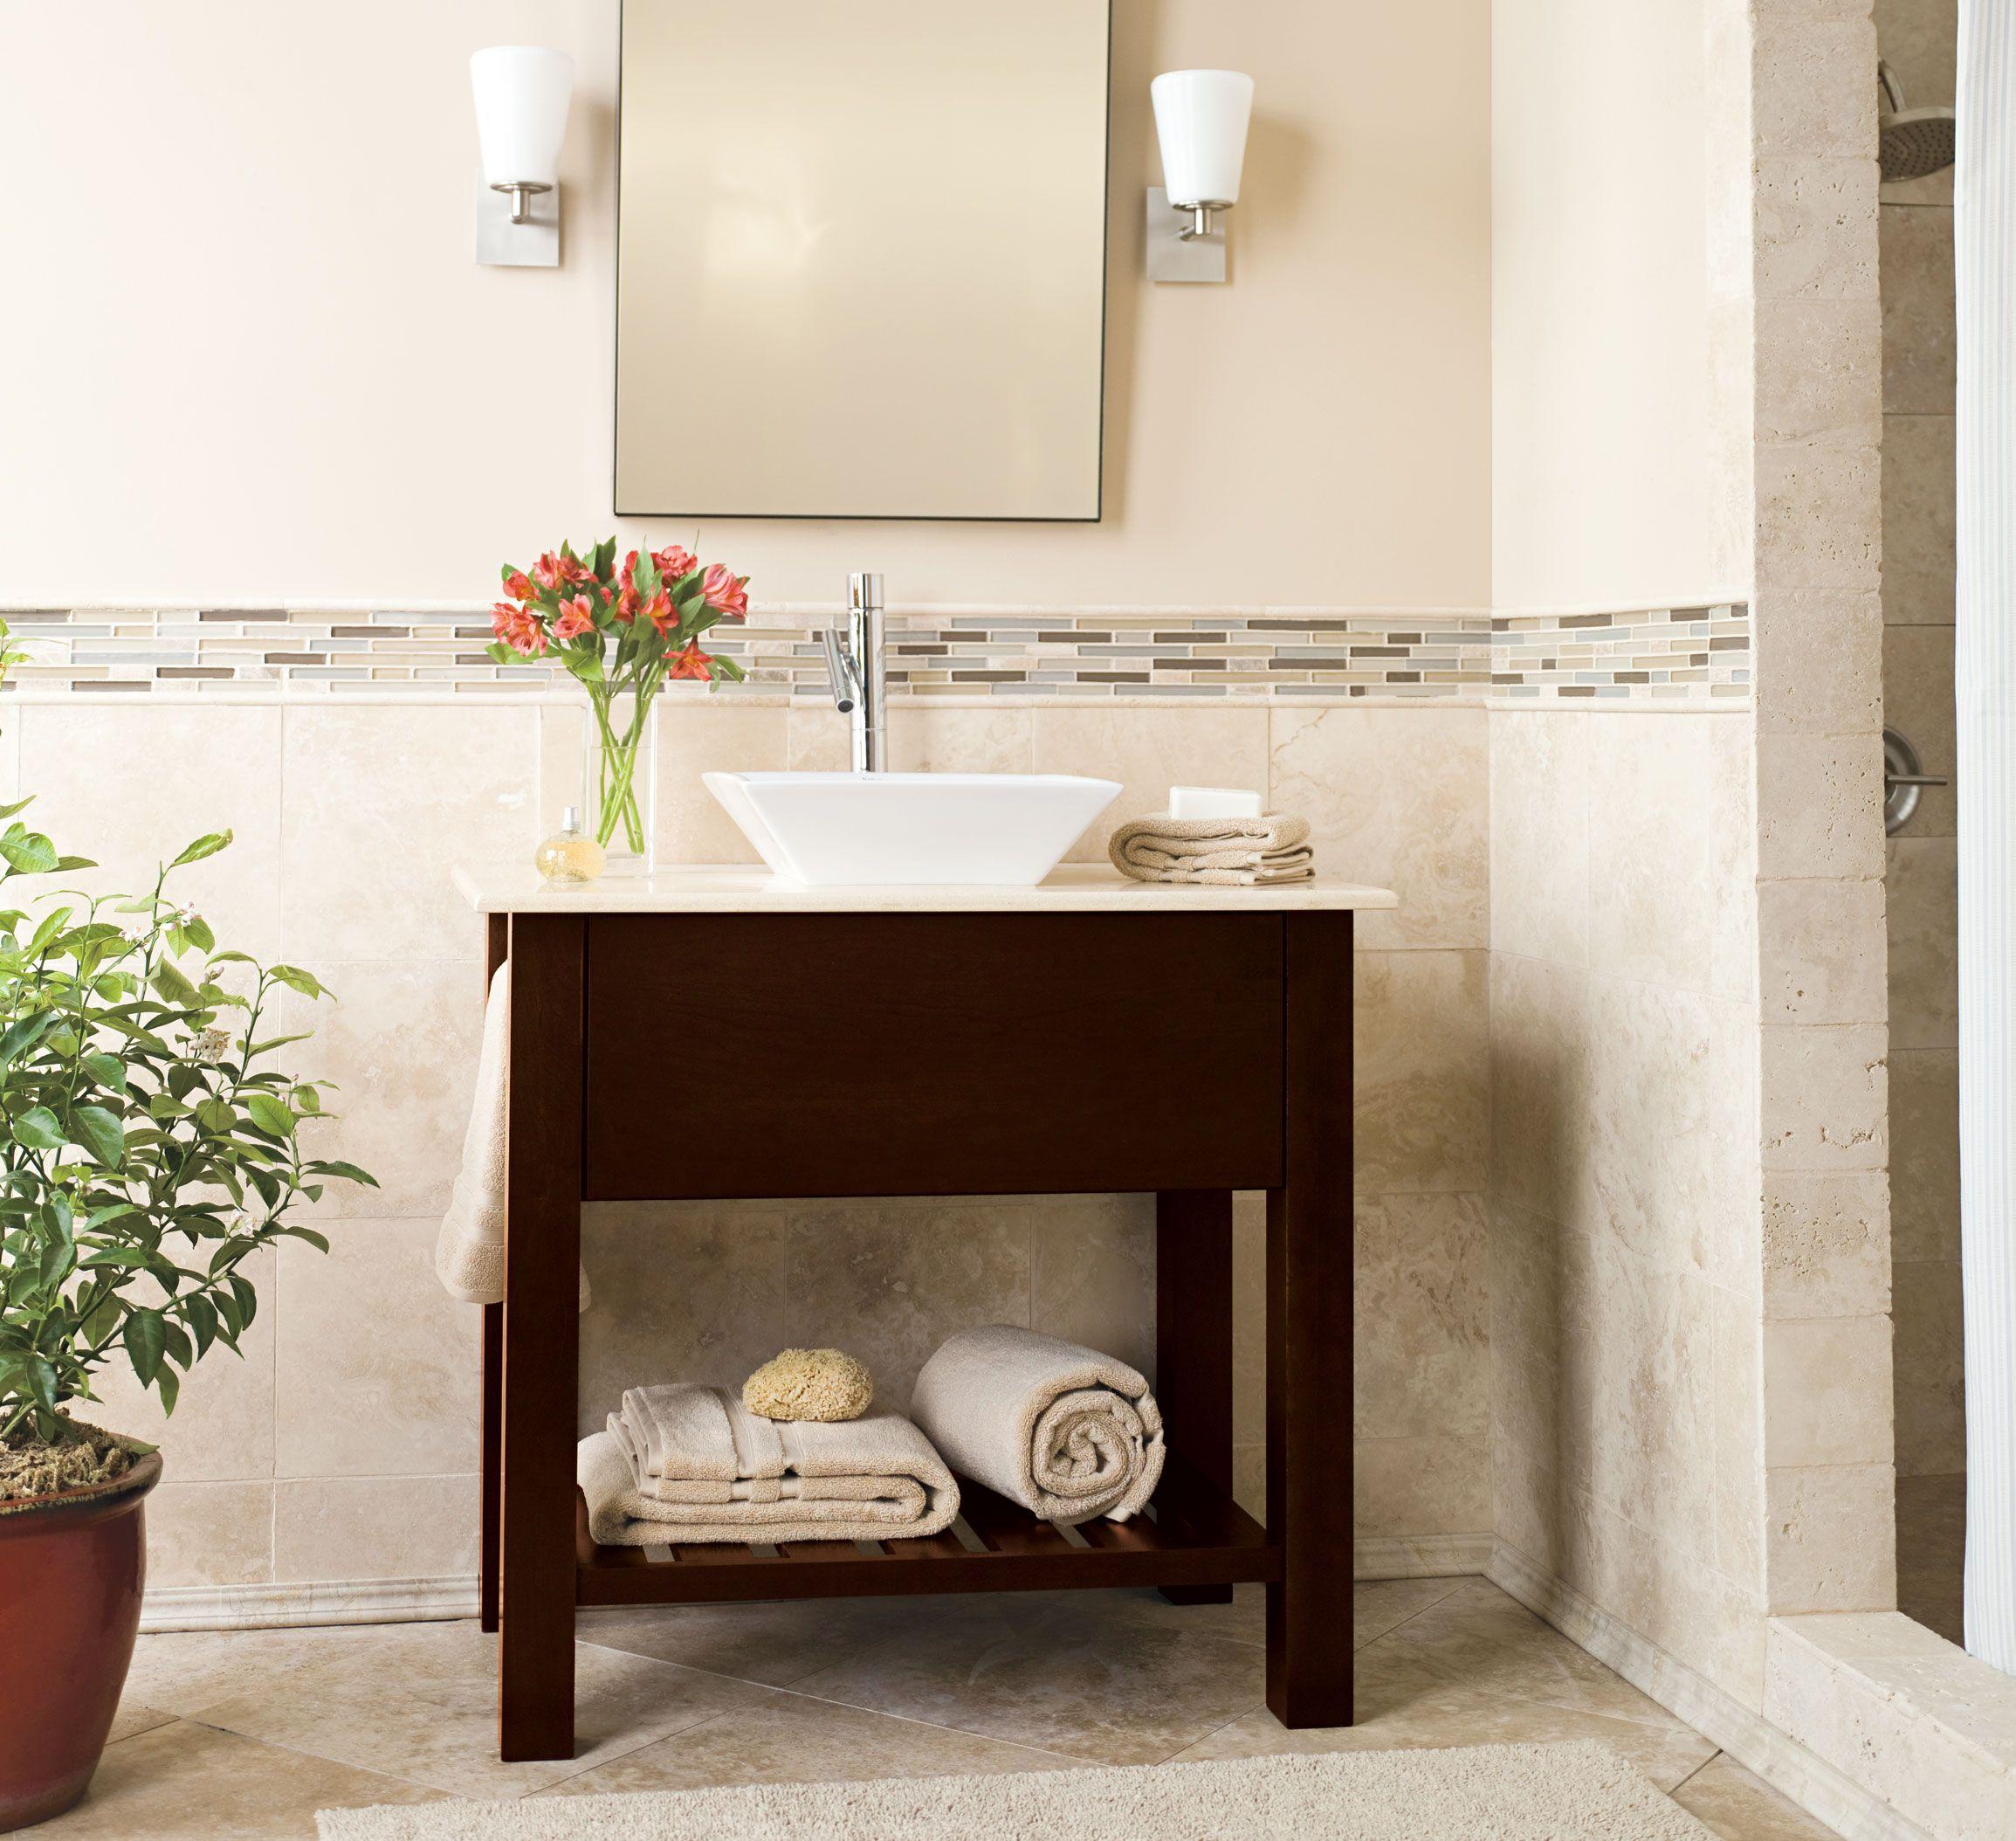 Keep your bathroom sleek and simple with the Homestead ... on Bathroom Ideas With Maple Cabinets  id=43050